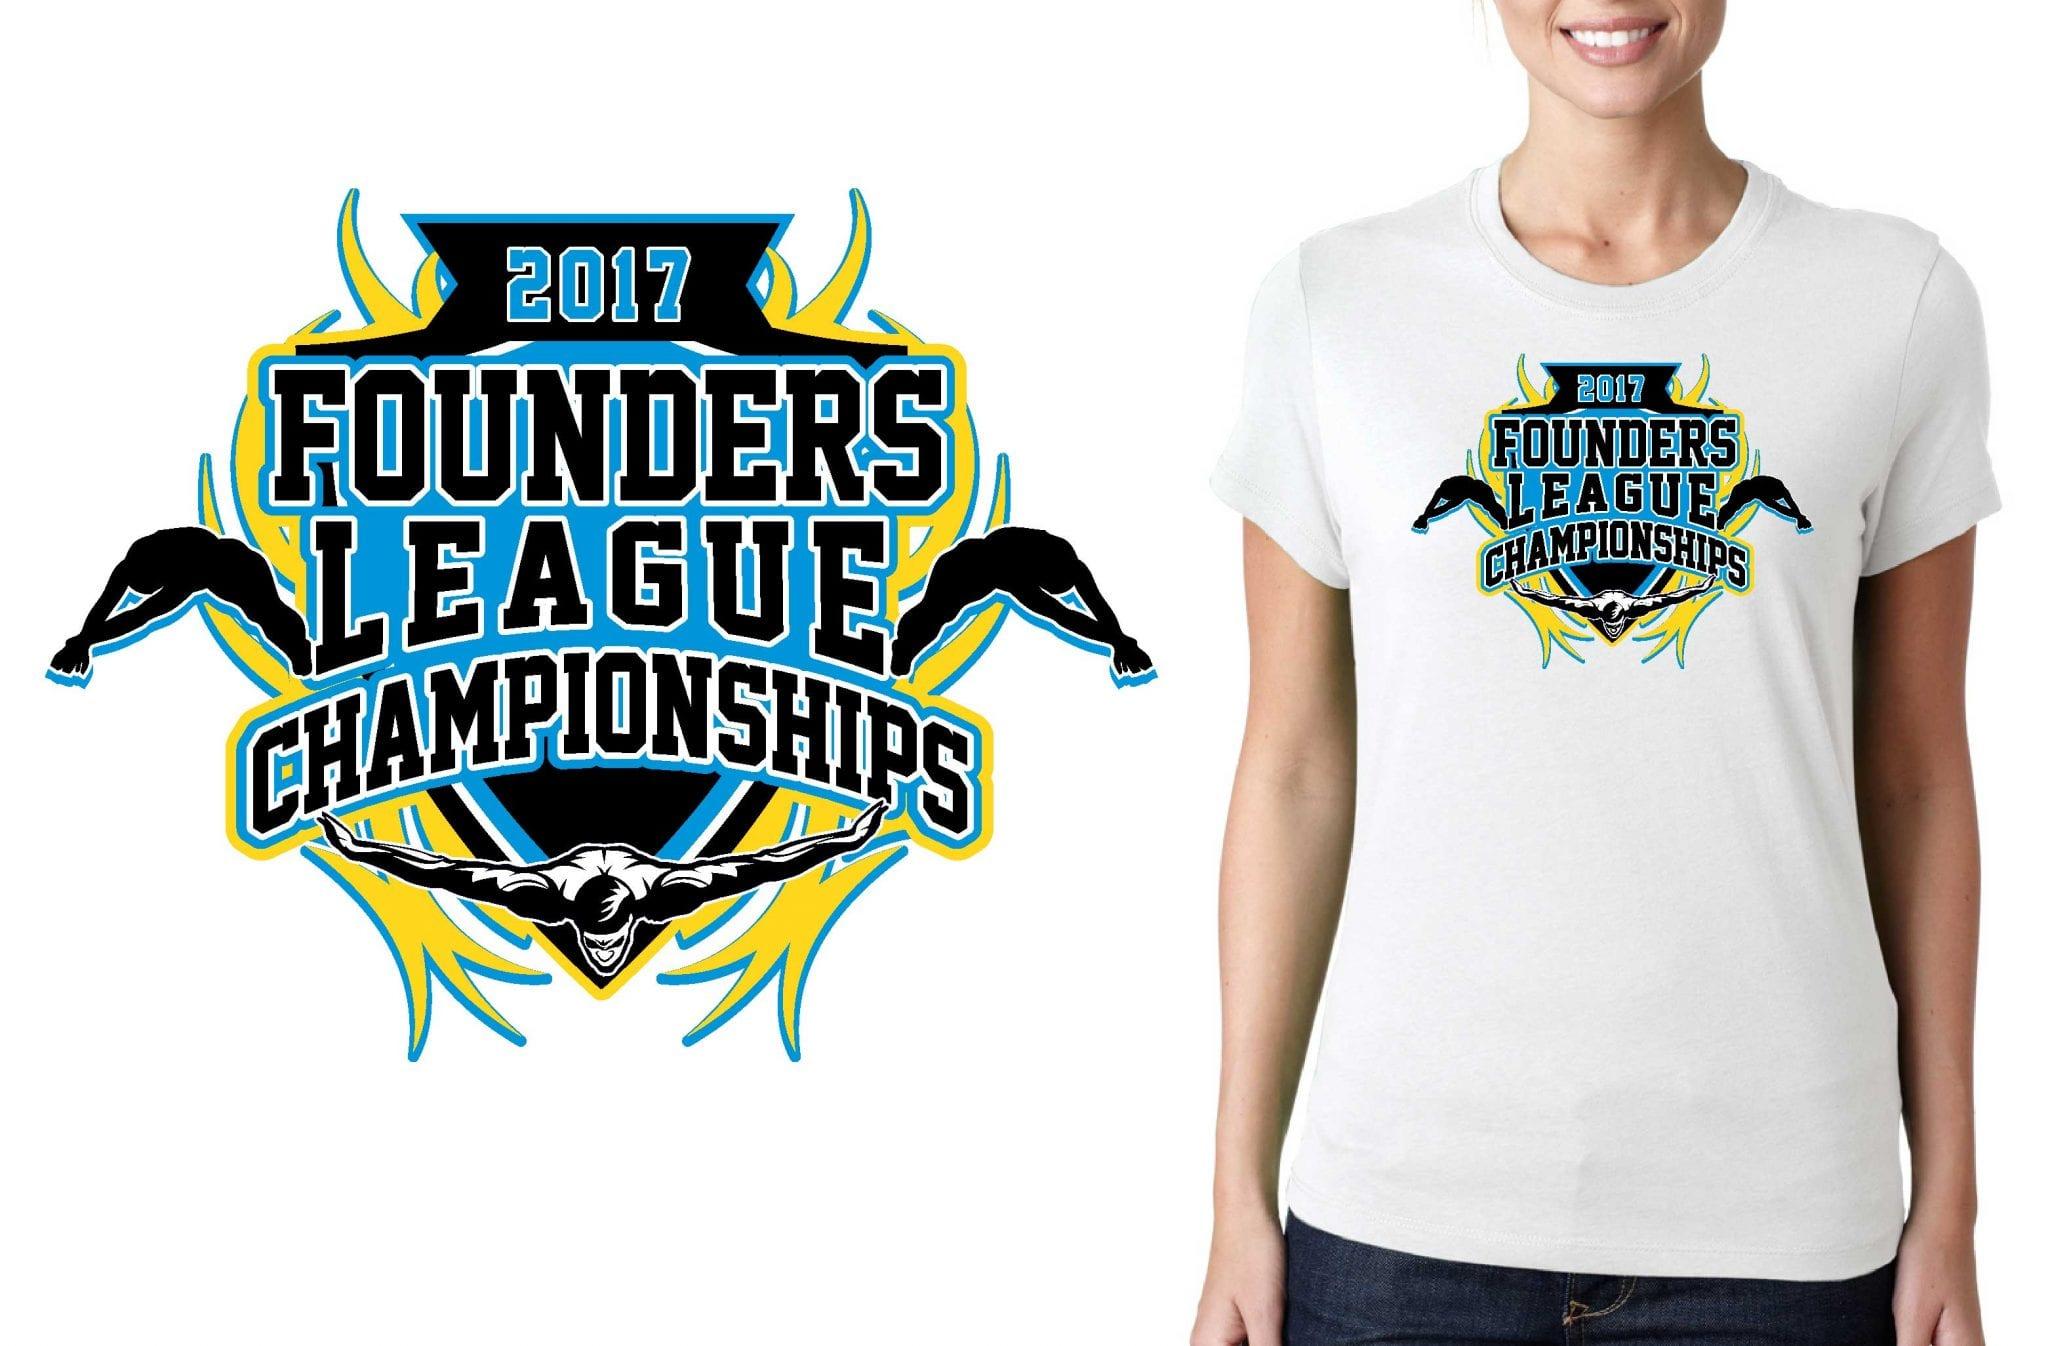 SWUN TSHIRT LOGO DESIGN Founders-League-Championships UrArtStudio